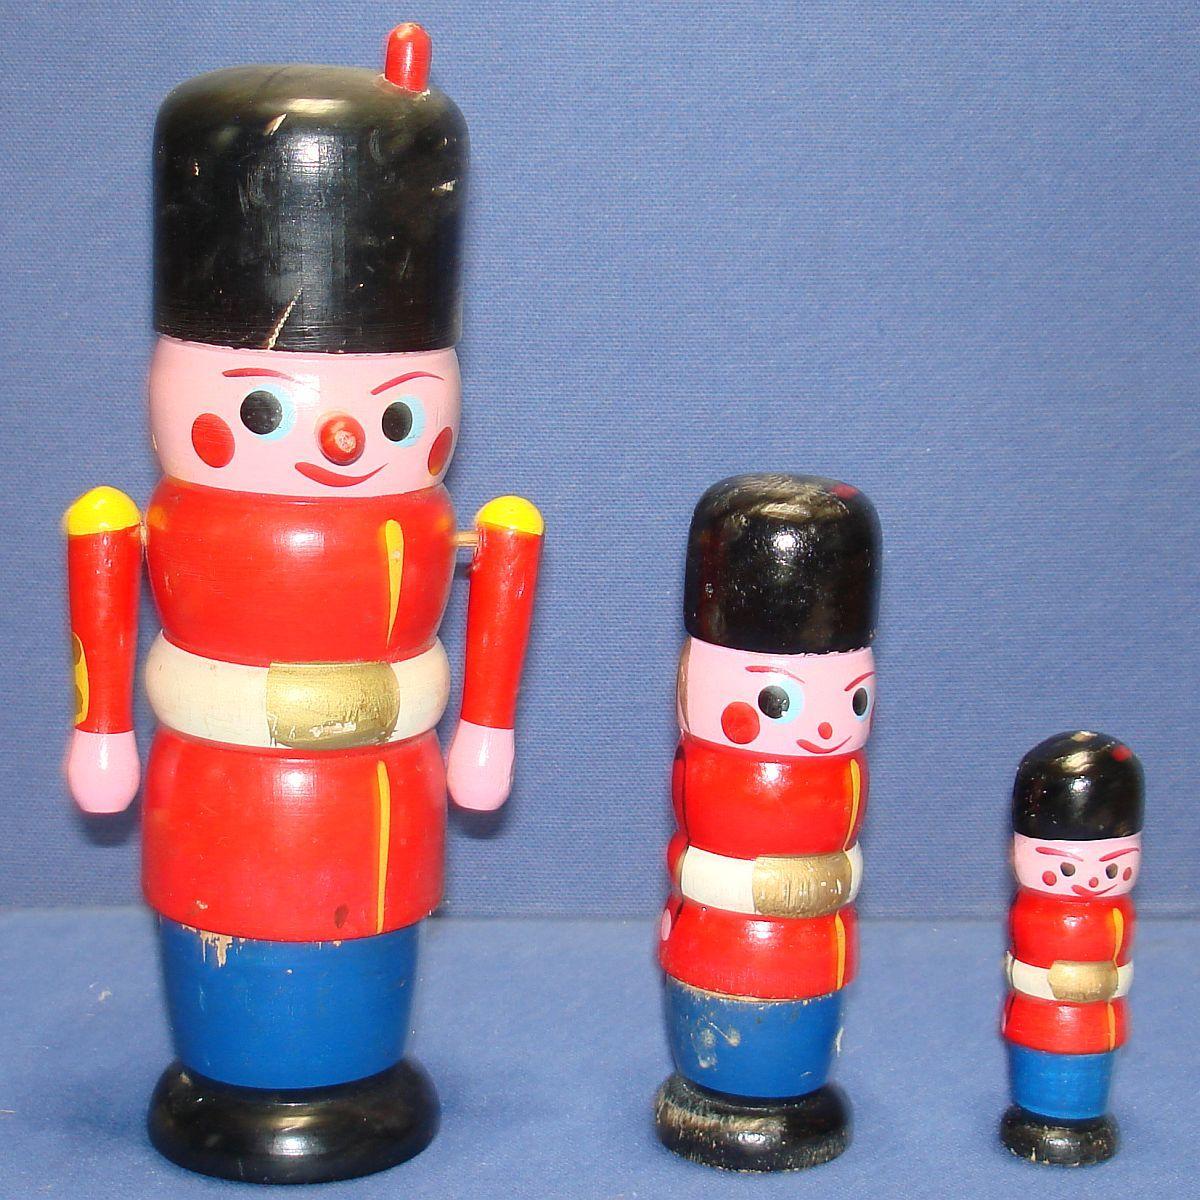 The Nutcracker Vintage Wooden Toys Vintage Toys For